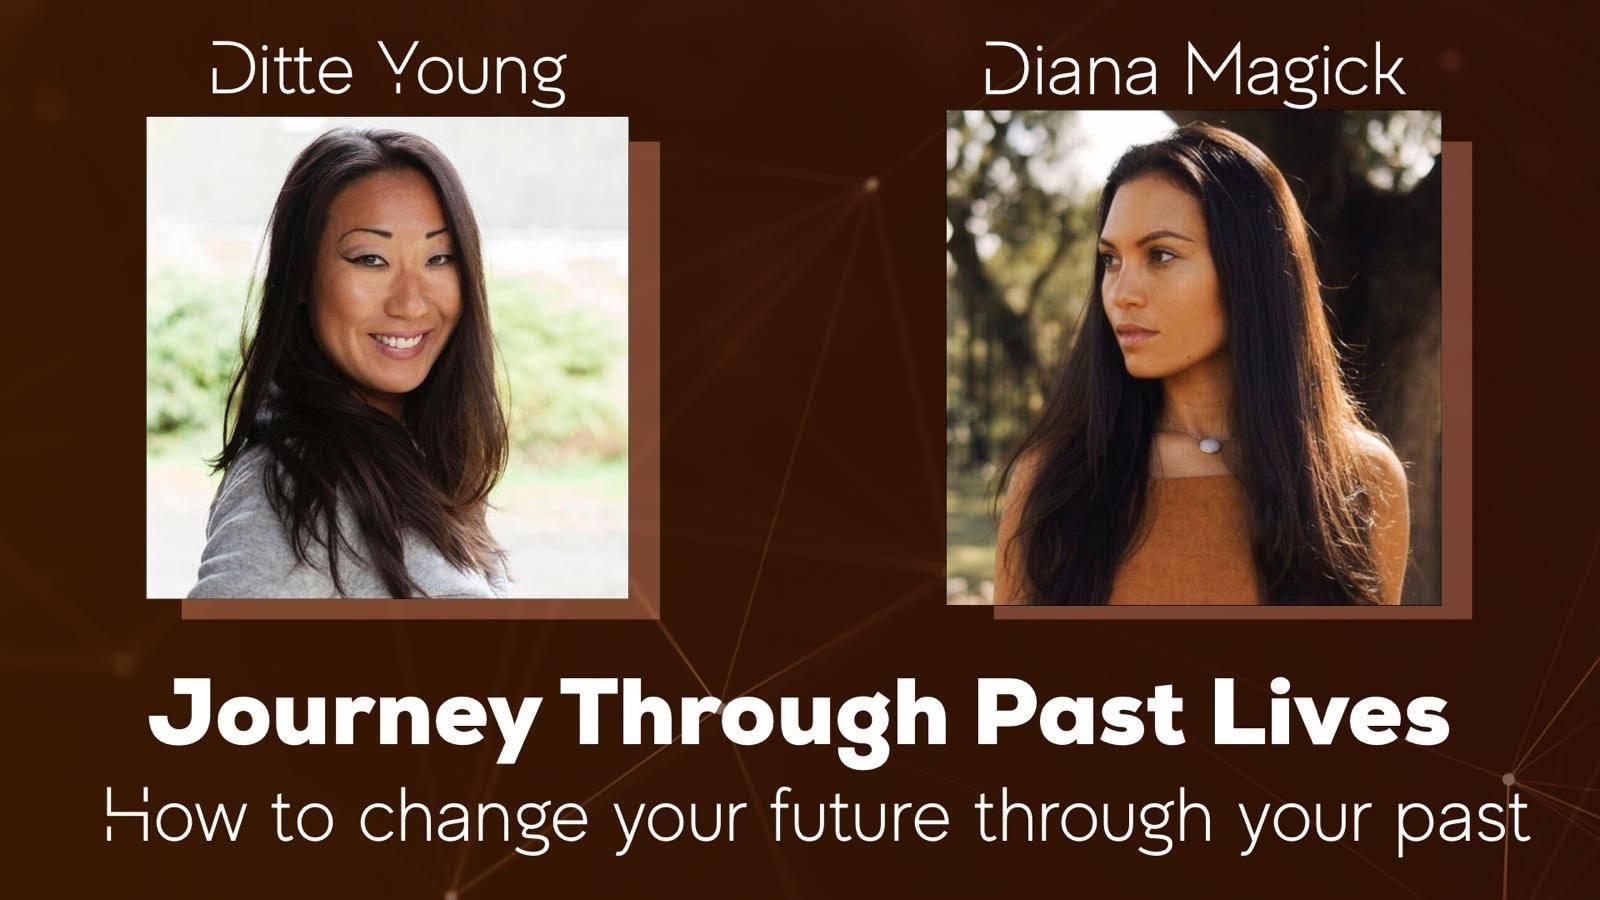 Journey through past lives